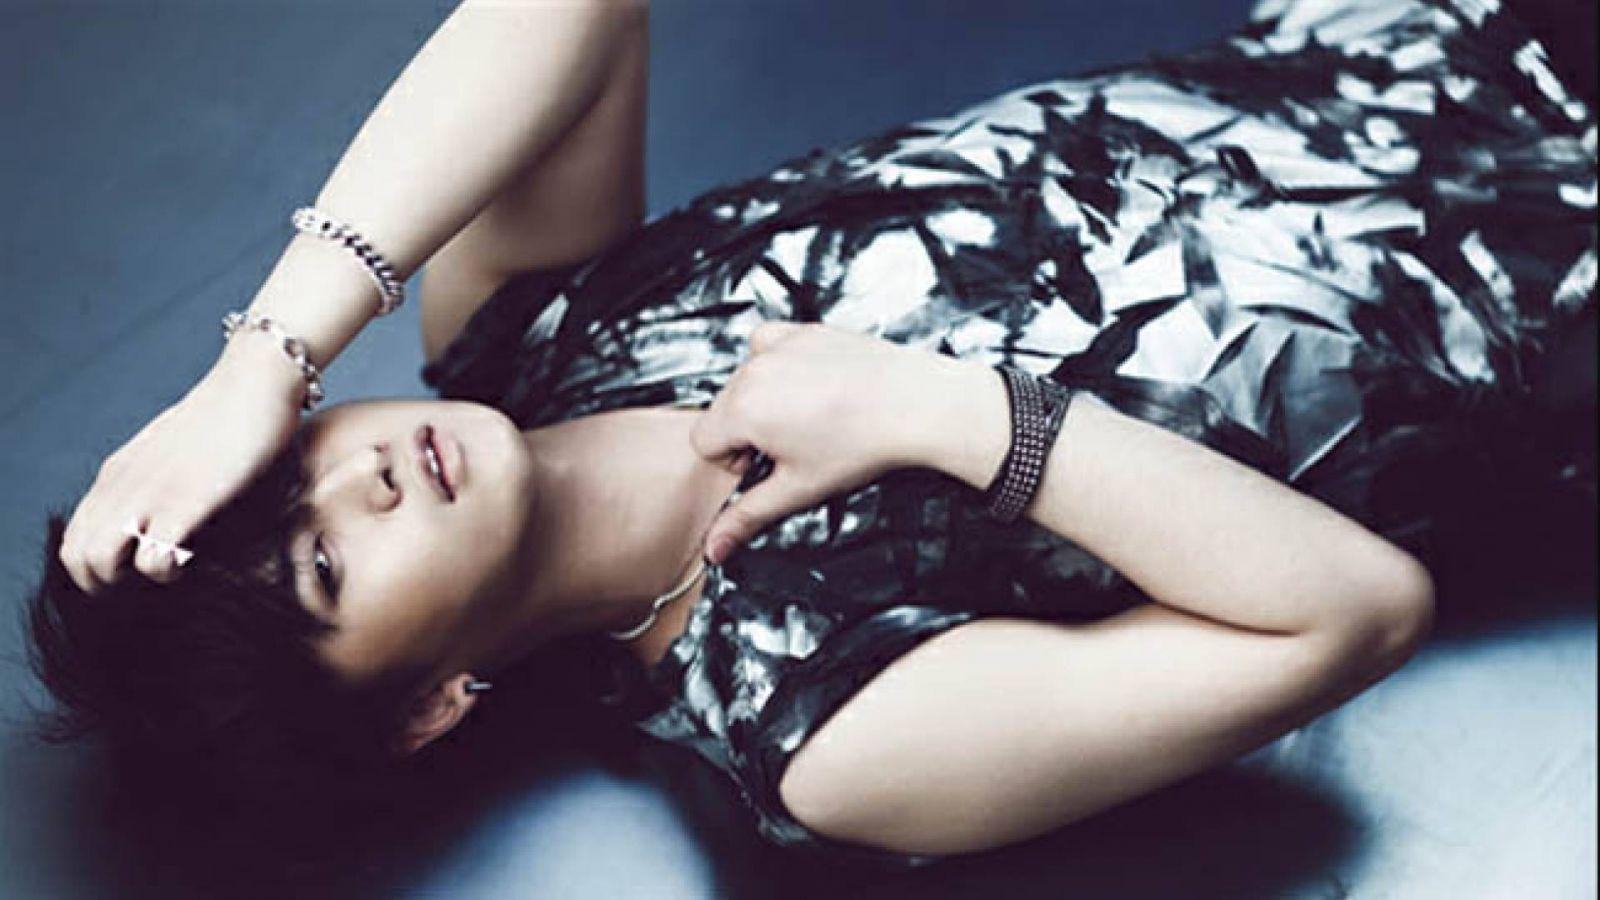 Heo Young Saeng © Heo Young Saeng